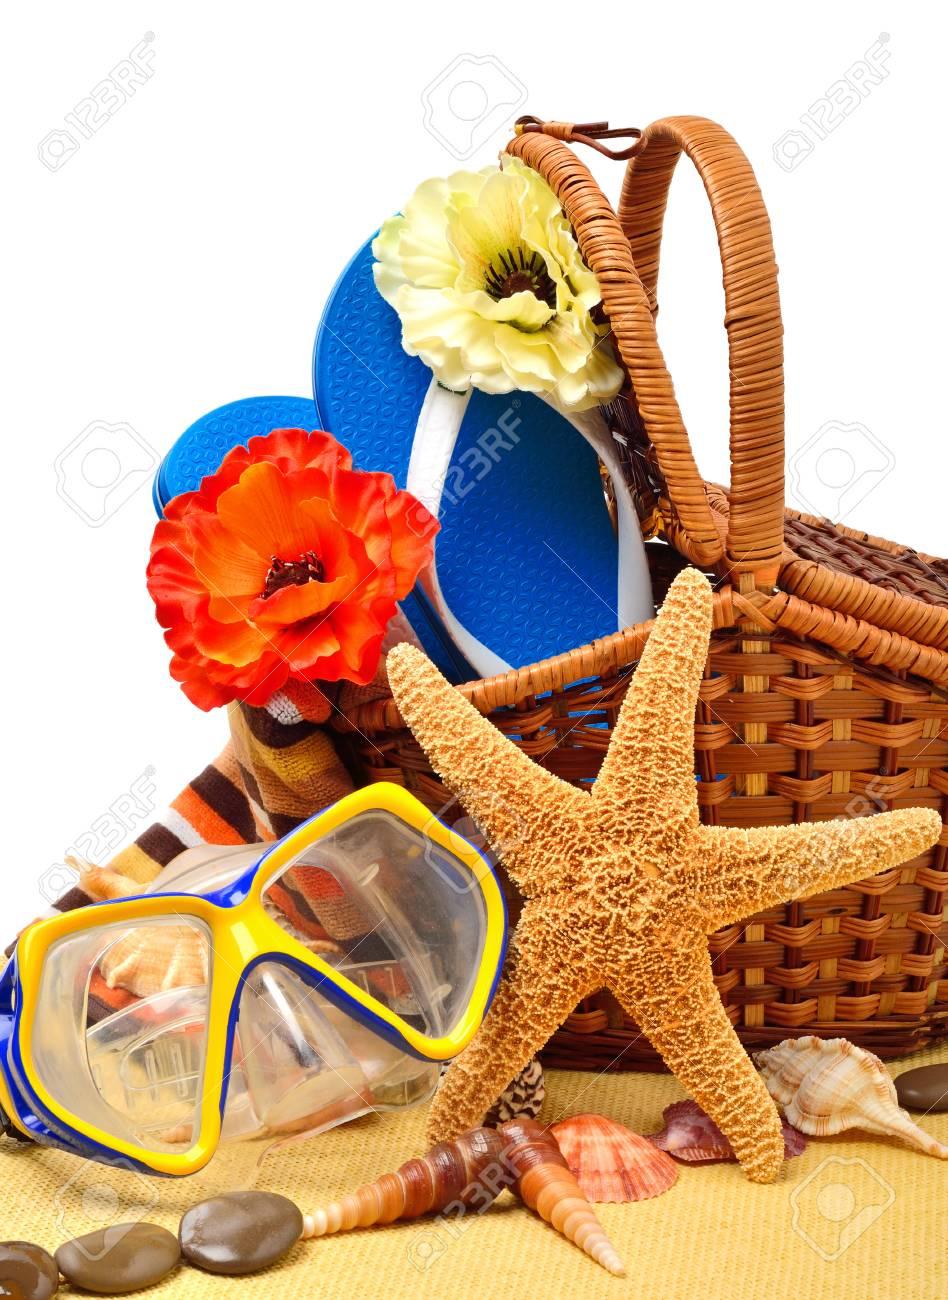 Flip-flops, fishstar, wicker basket, goggles isolated on white. - 77274275